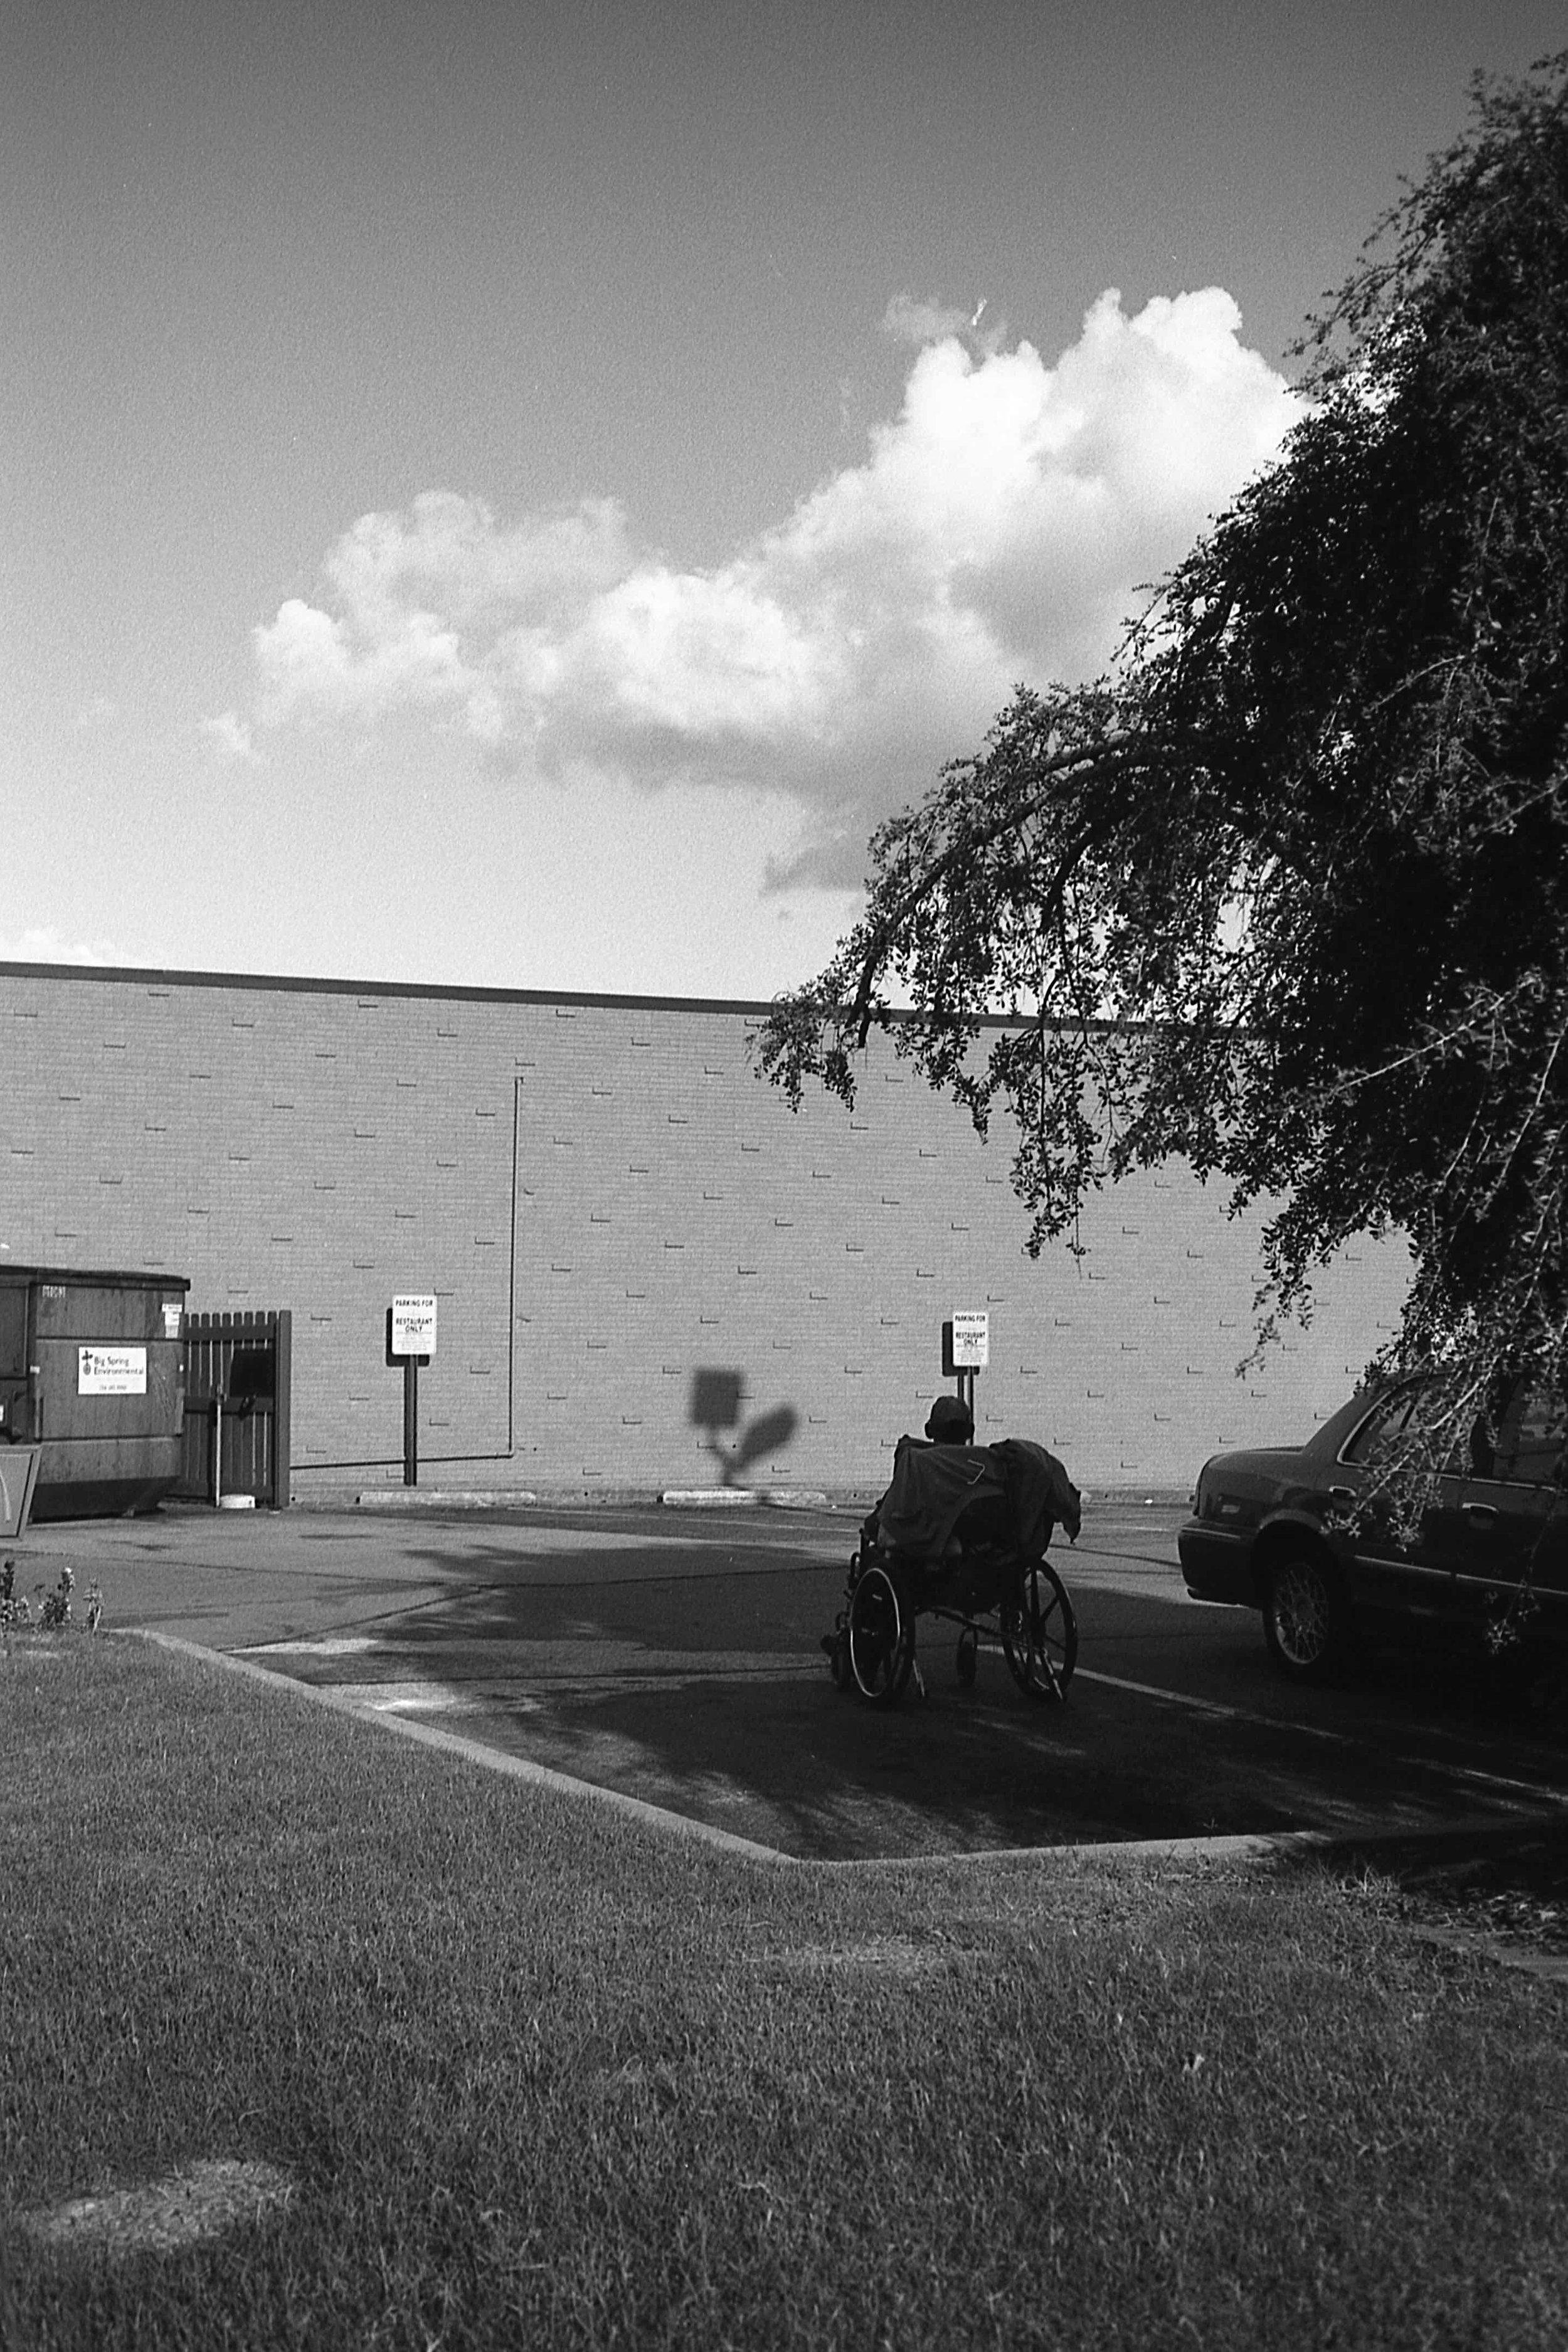 Matt Pittman / Ilford Panf 50 / Leica M7 / Huntsville, AL